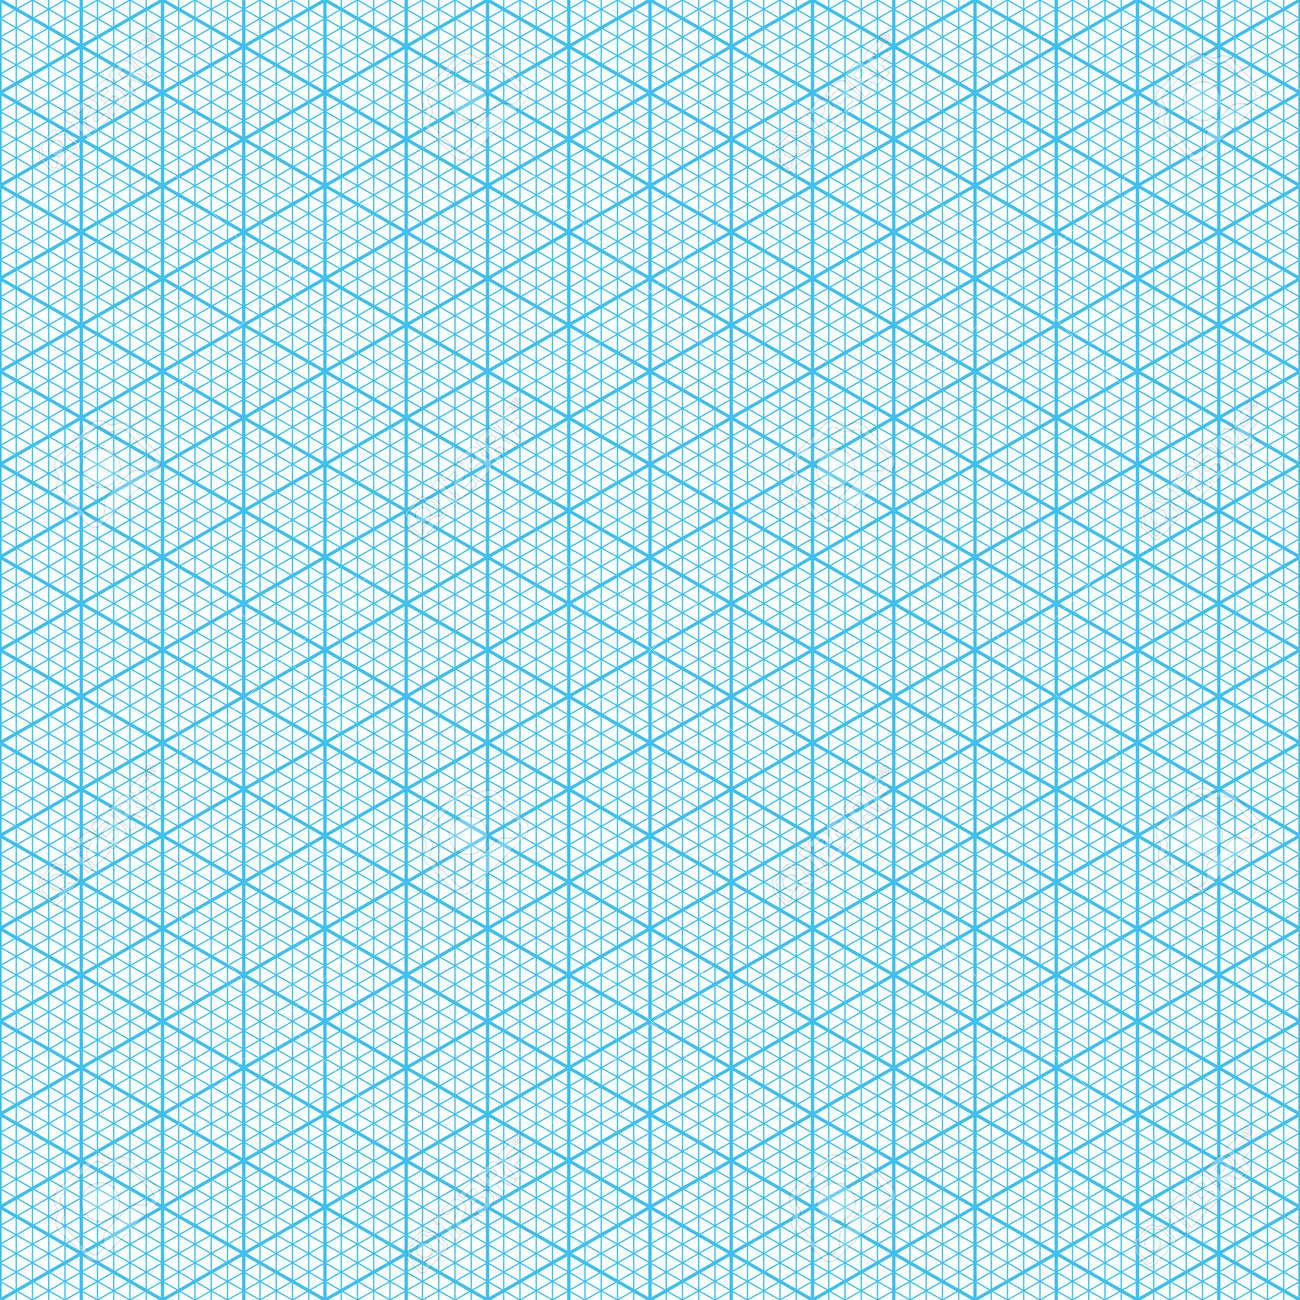 Isometric Graph Paper Seamless Illustration Royalty Free Cliparts – Isometric Graph Paper